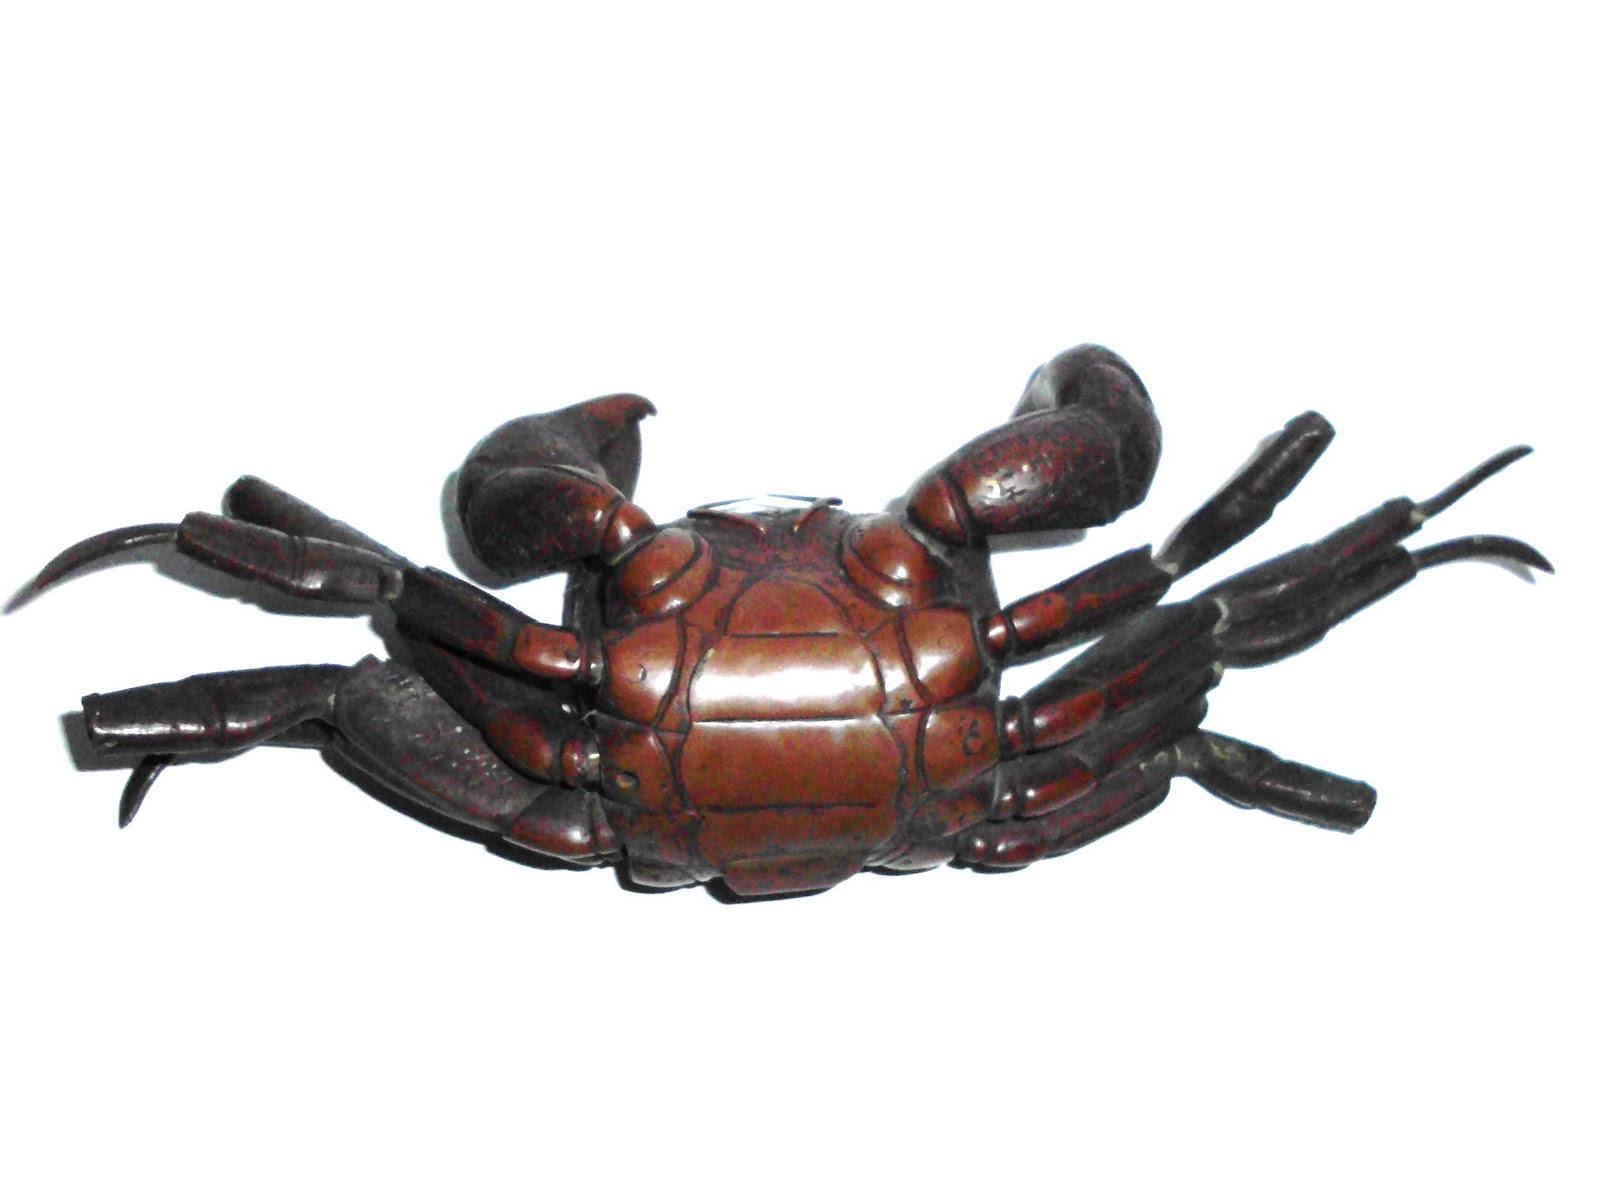 C 1800 Chinese Bronze Red Crab With Detailed Anatomy